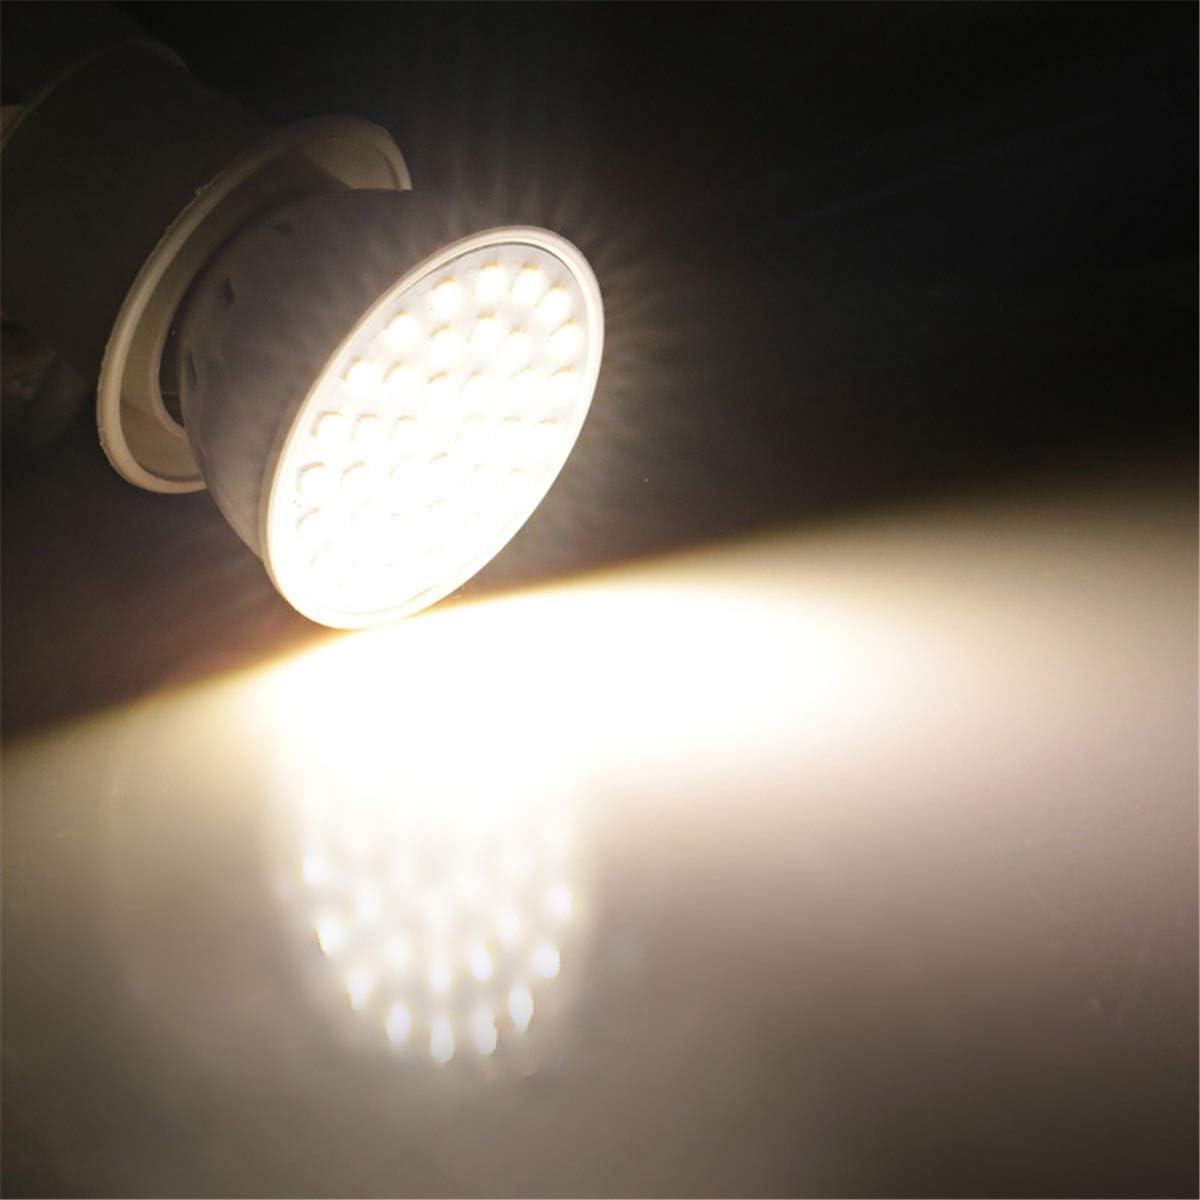 5PCS CNBEAU-LED MR16 LED Spotlight Bulbs 54LED 5W LED 2835SMD 400-500Lm Warm White Cool White Natural White AC 110V//AC 220V Color : 110V, Size : Natural White